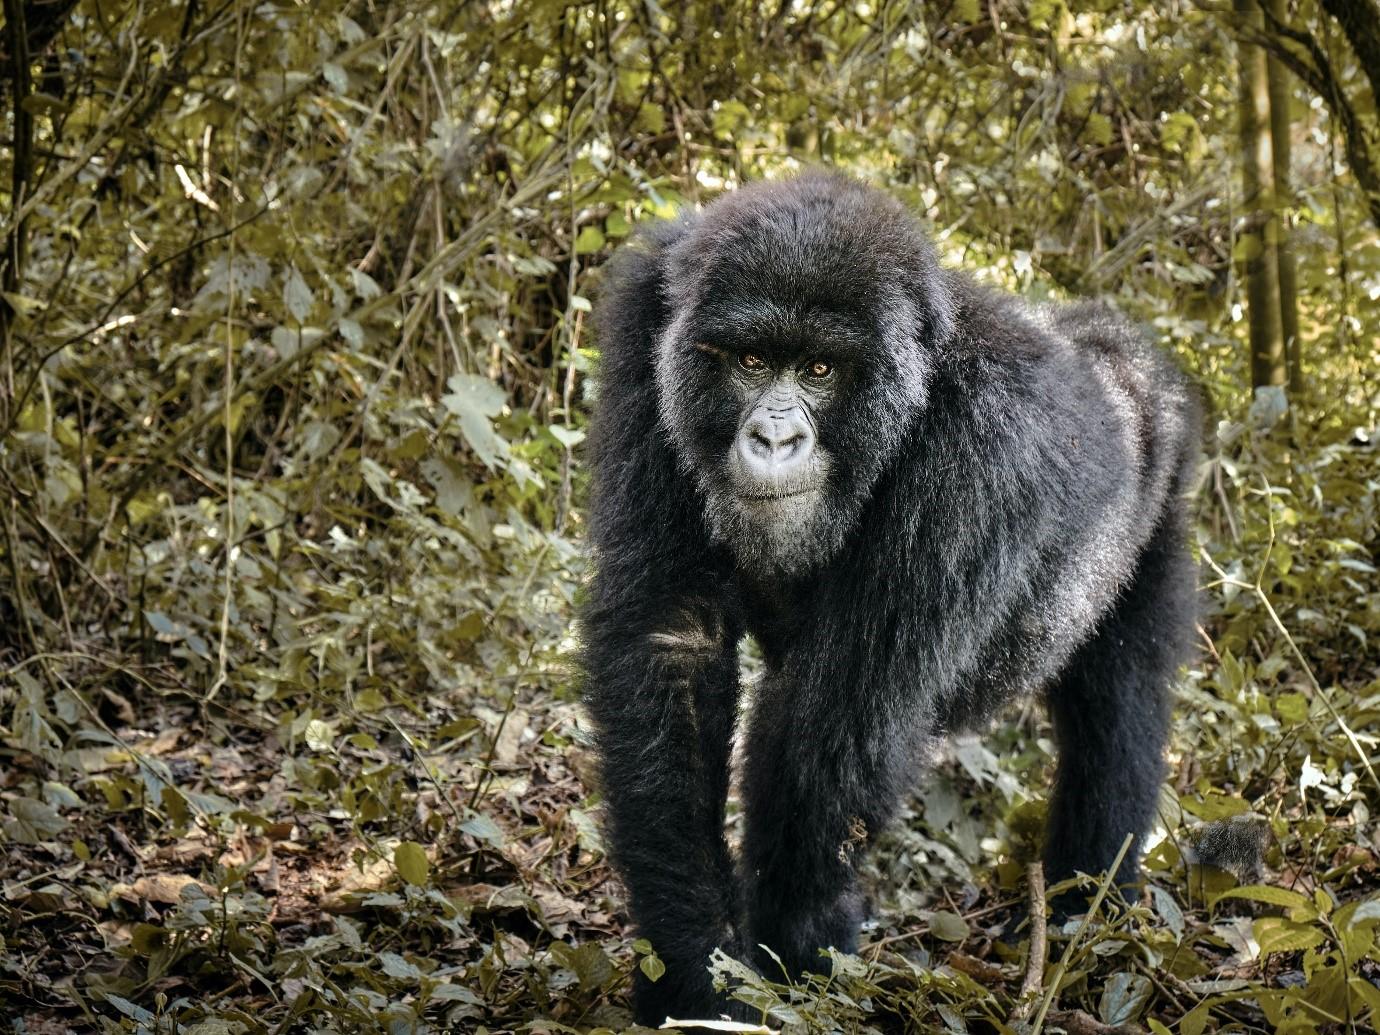 A gorilla in Virunga, Democratic Republic of Congo. Photo by Luc Huyghebaert on Unsplash